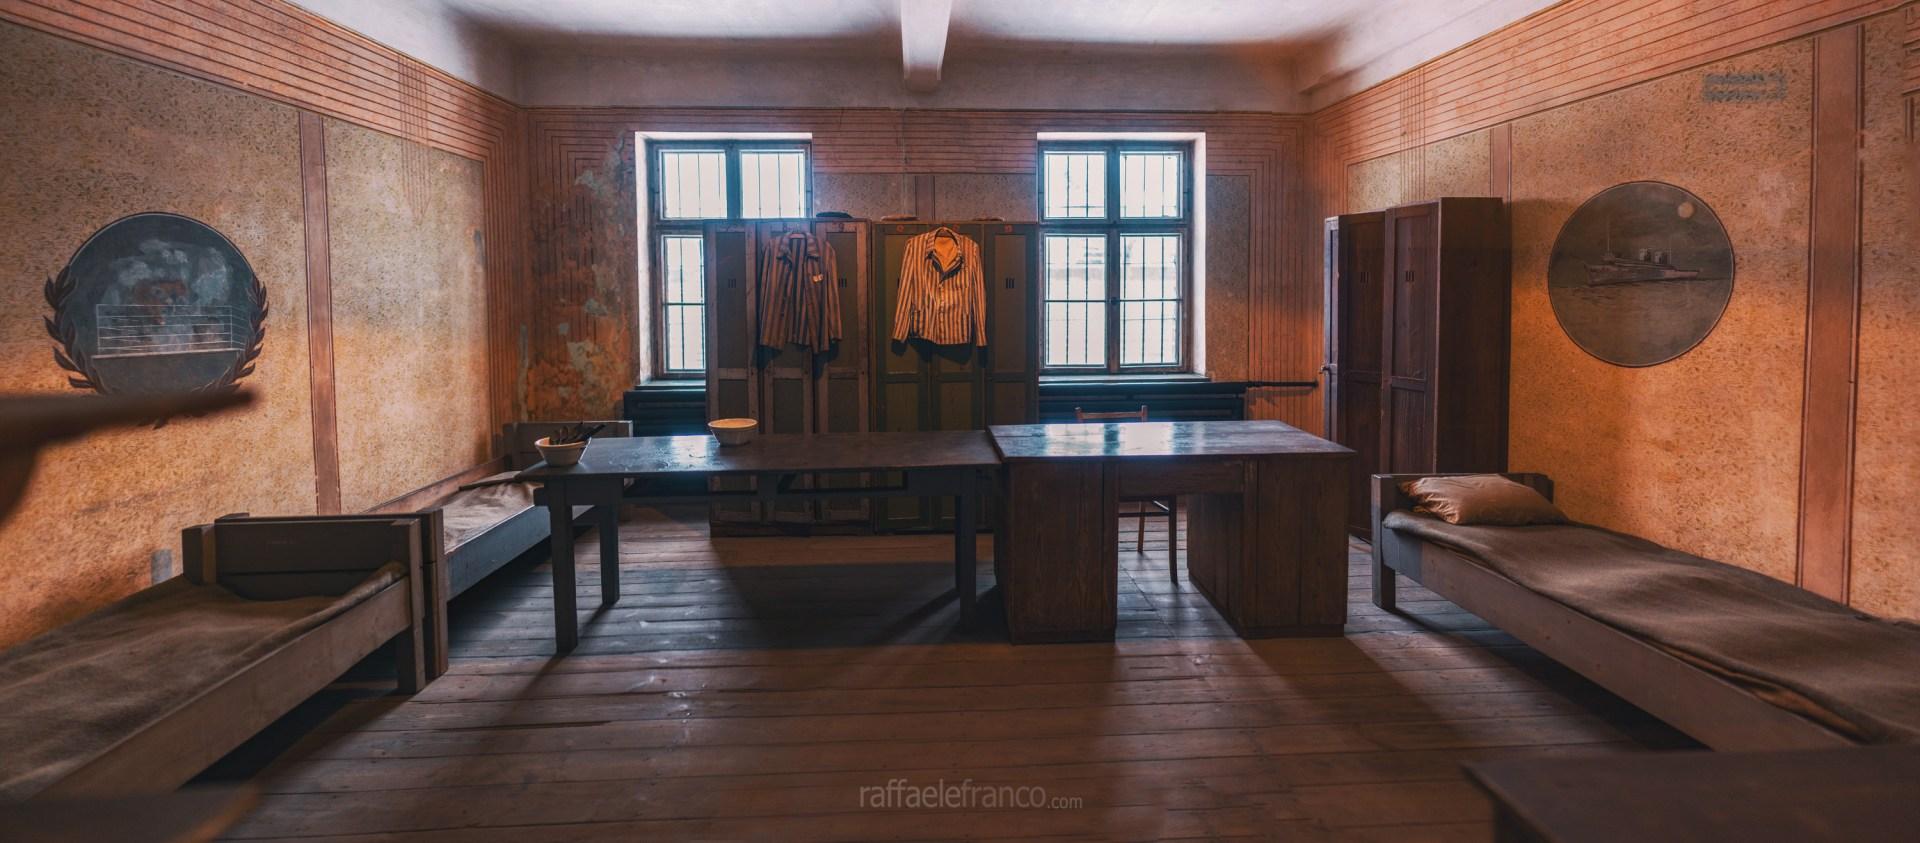 L'alloggio dei Sonderkommando ad Auschwitz